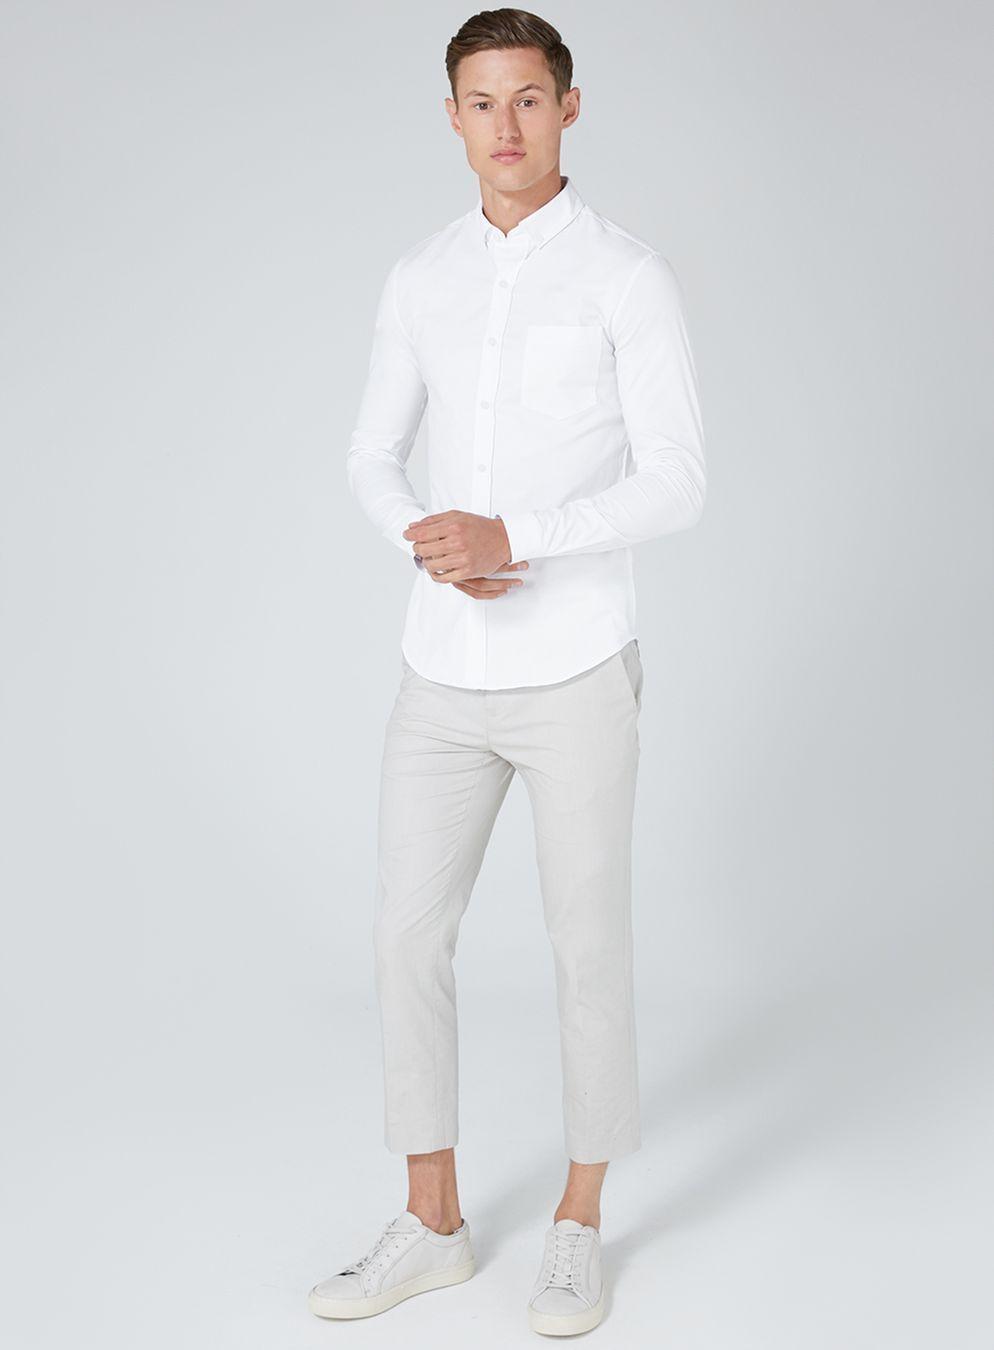 ea6c4c26b74 White Muscle Fit Oxford Shirt - TOPMAN USA  musclefitness